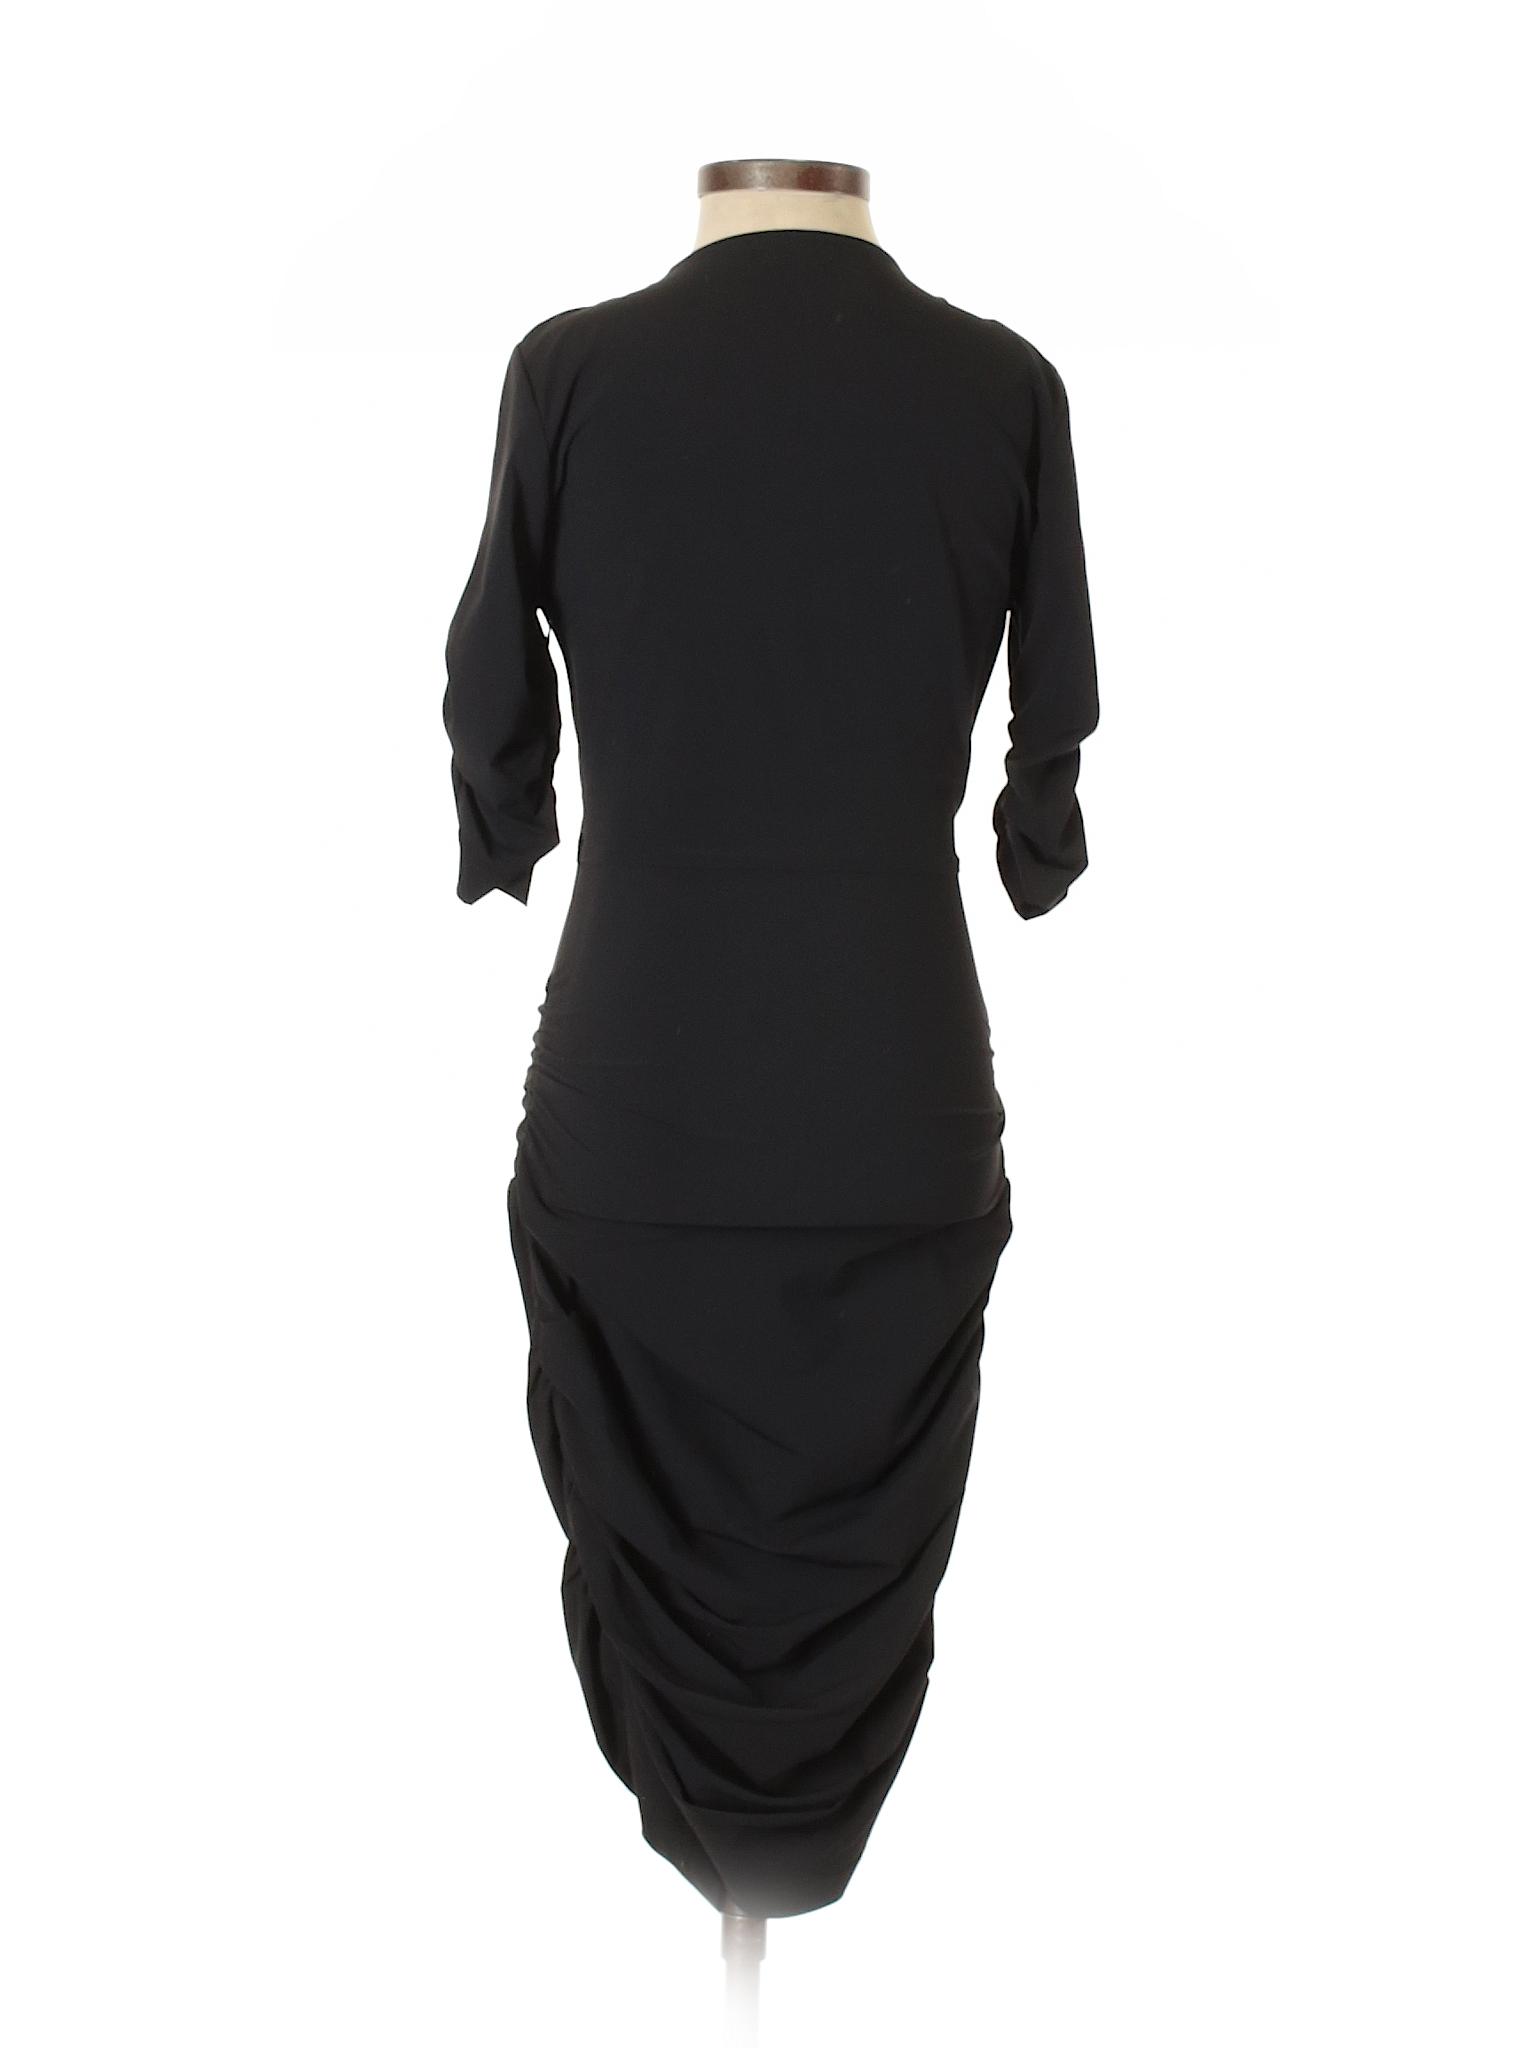 Dress Selling RACHEL Casual Rachel Roy HWHITq7